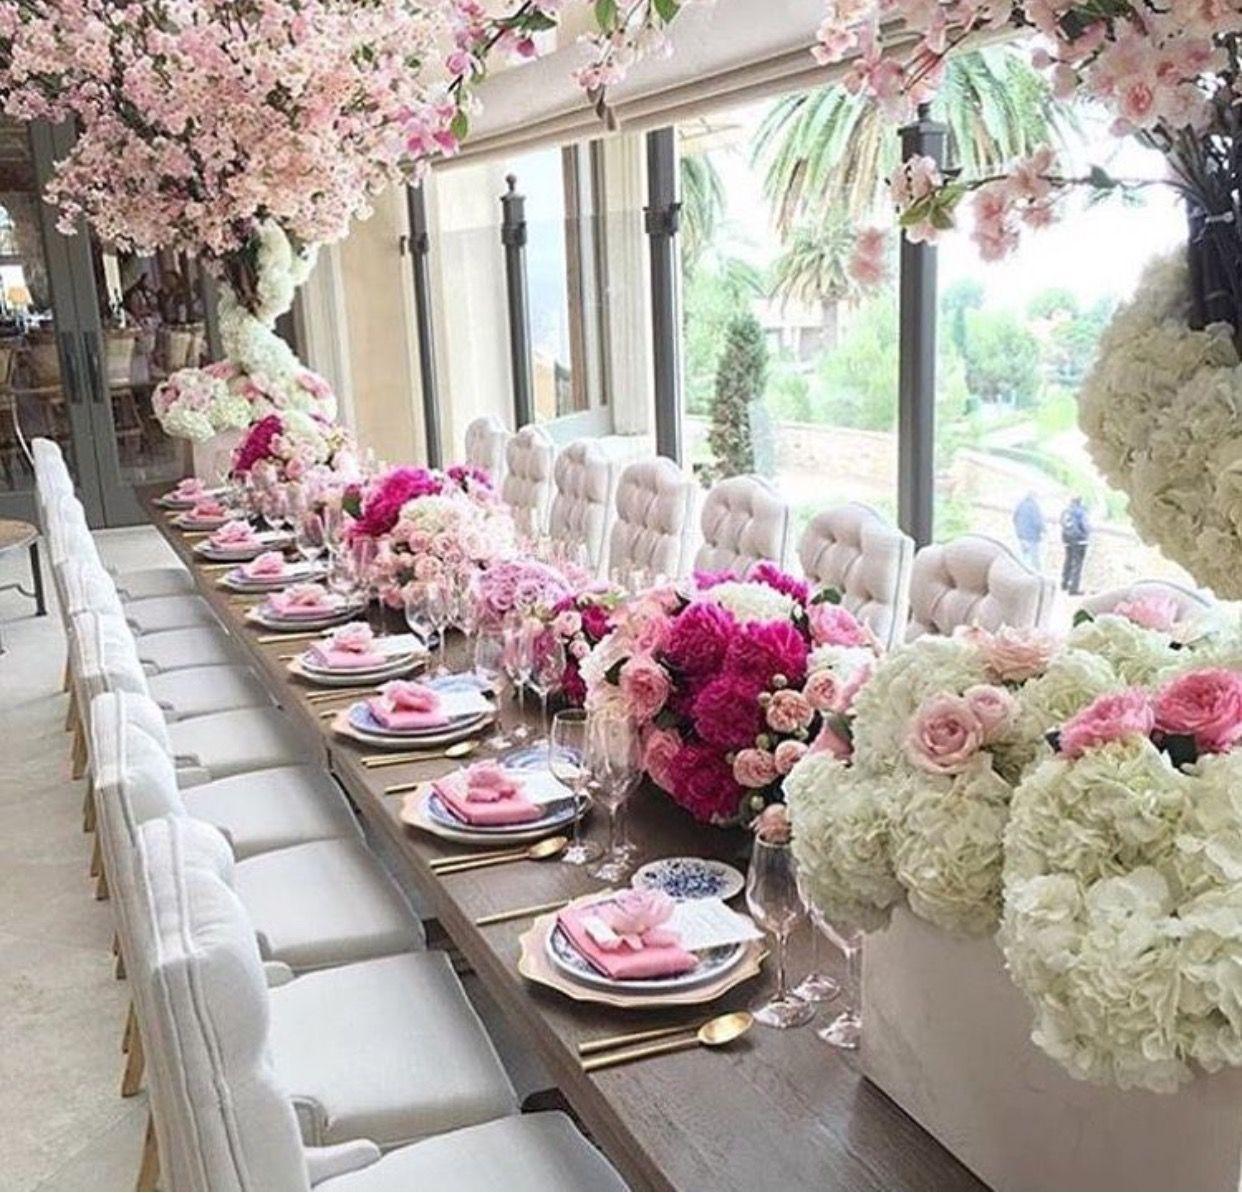 Wedding aisle decor ideas diy  Pin by Kristi Barr on Posh Party ideas  Pinterest